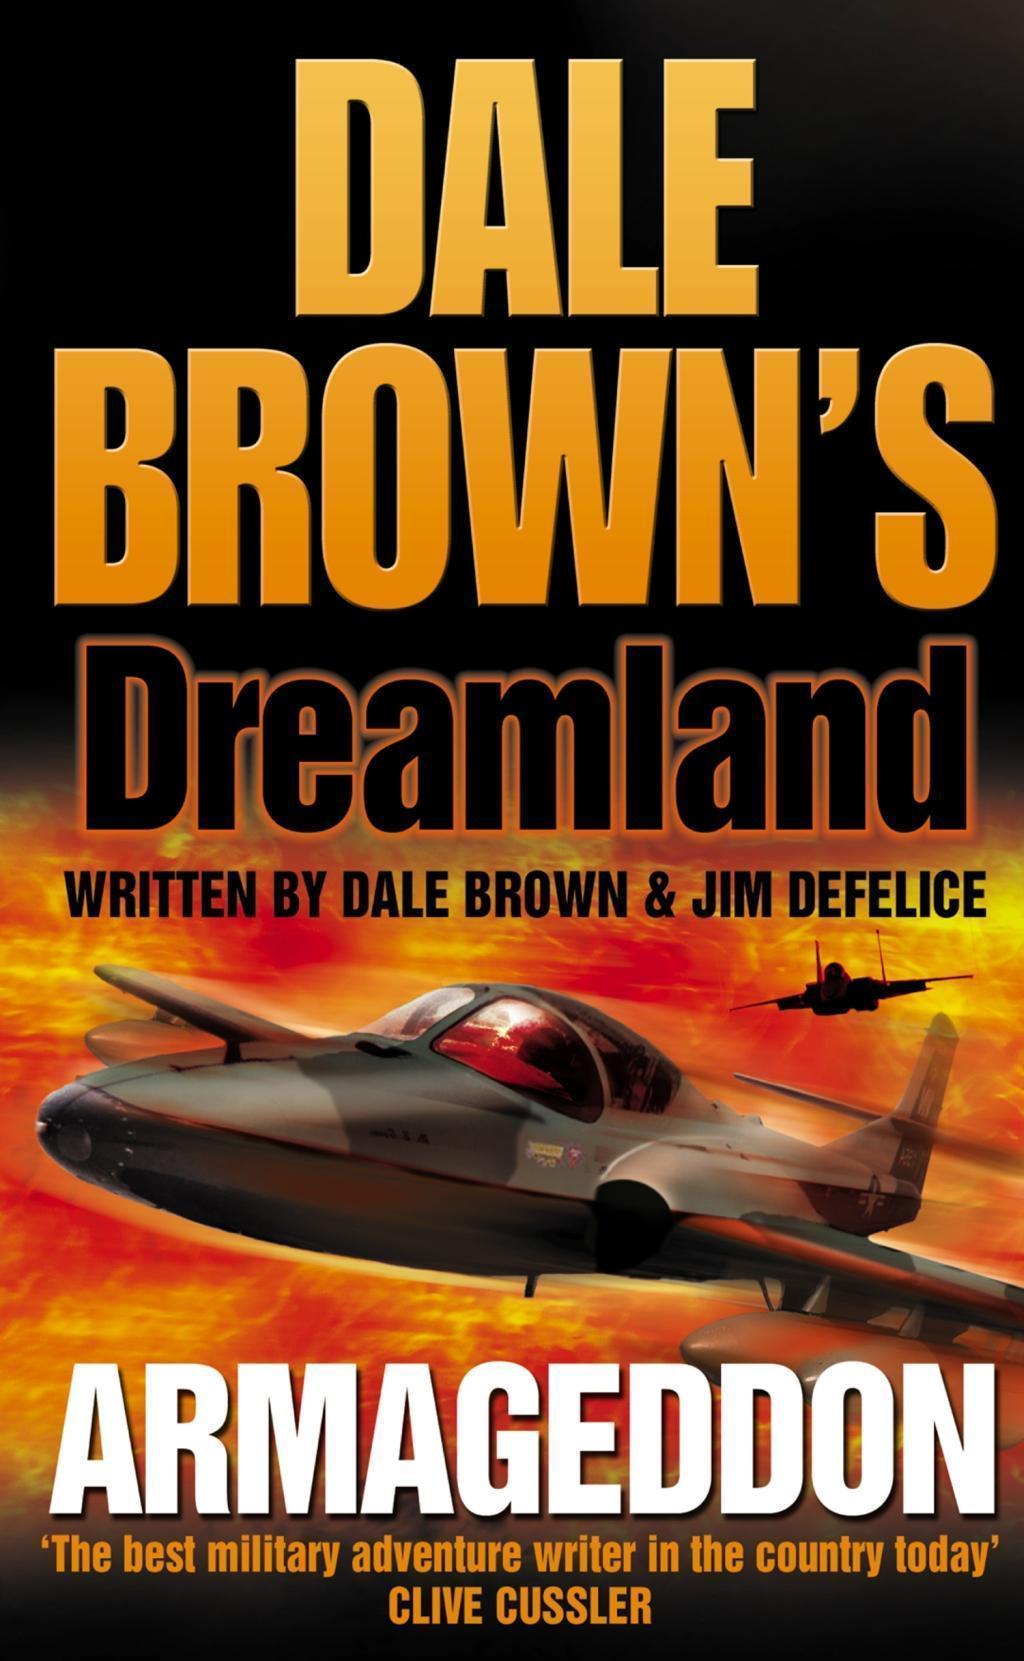 Armageddon (Dale Brown's Dreamland, Book 6)